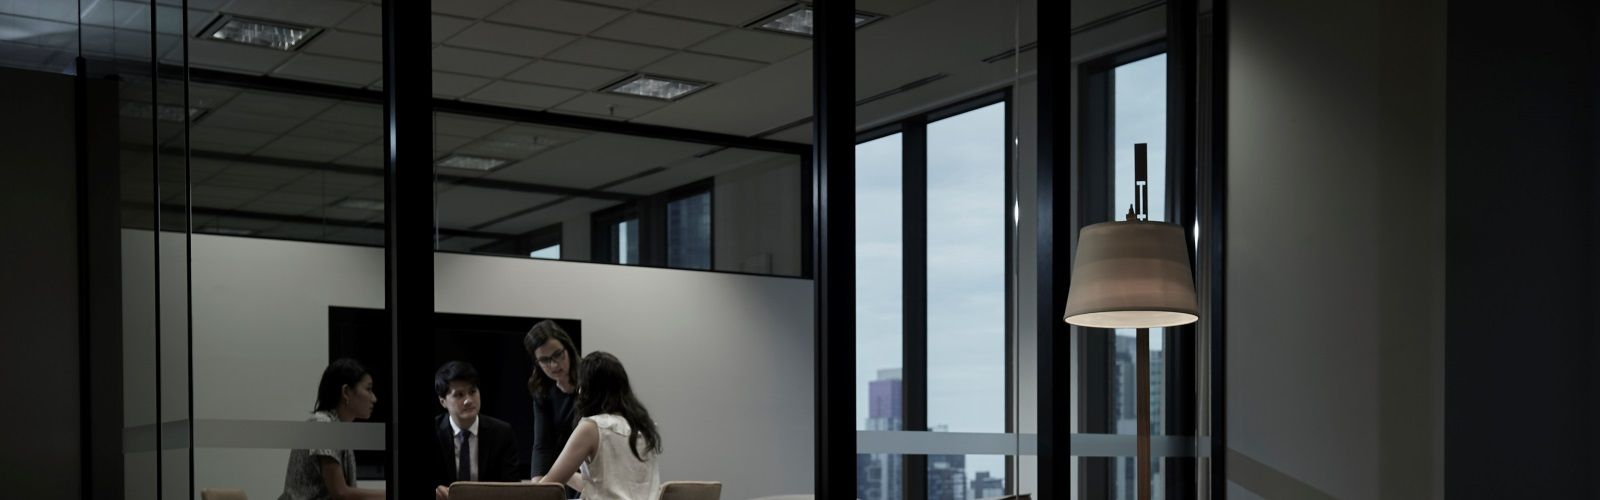 ABL Workplaceadvisory2